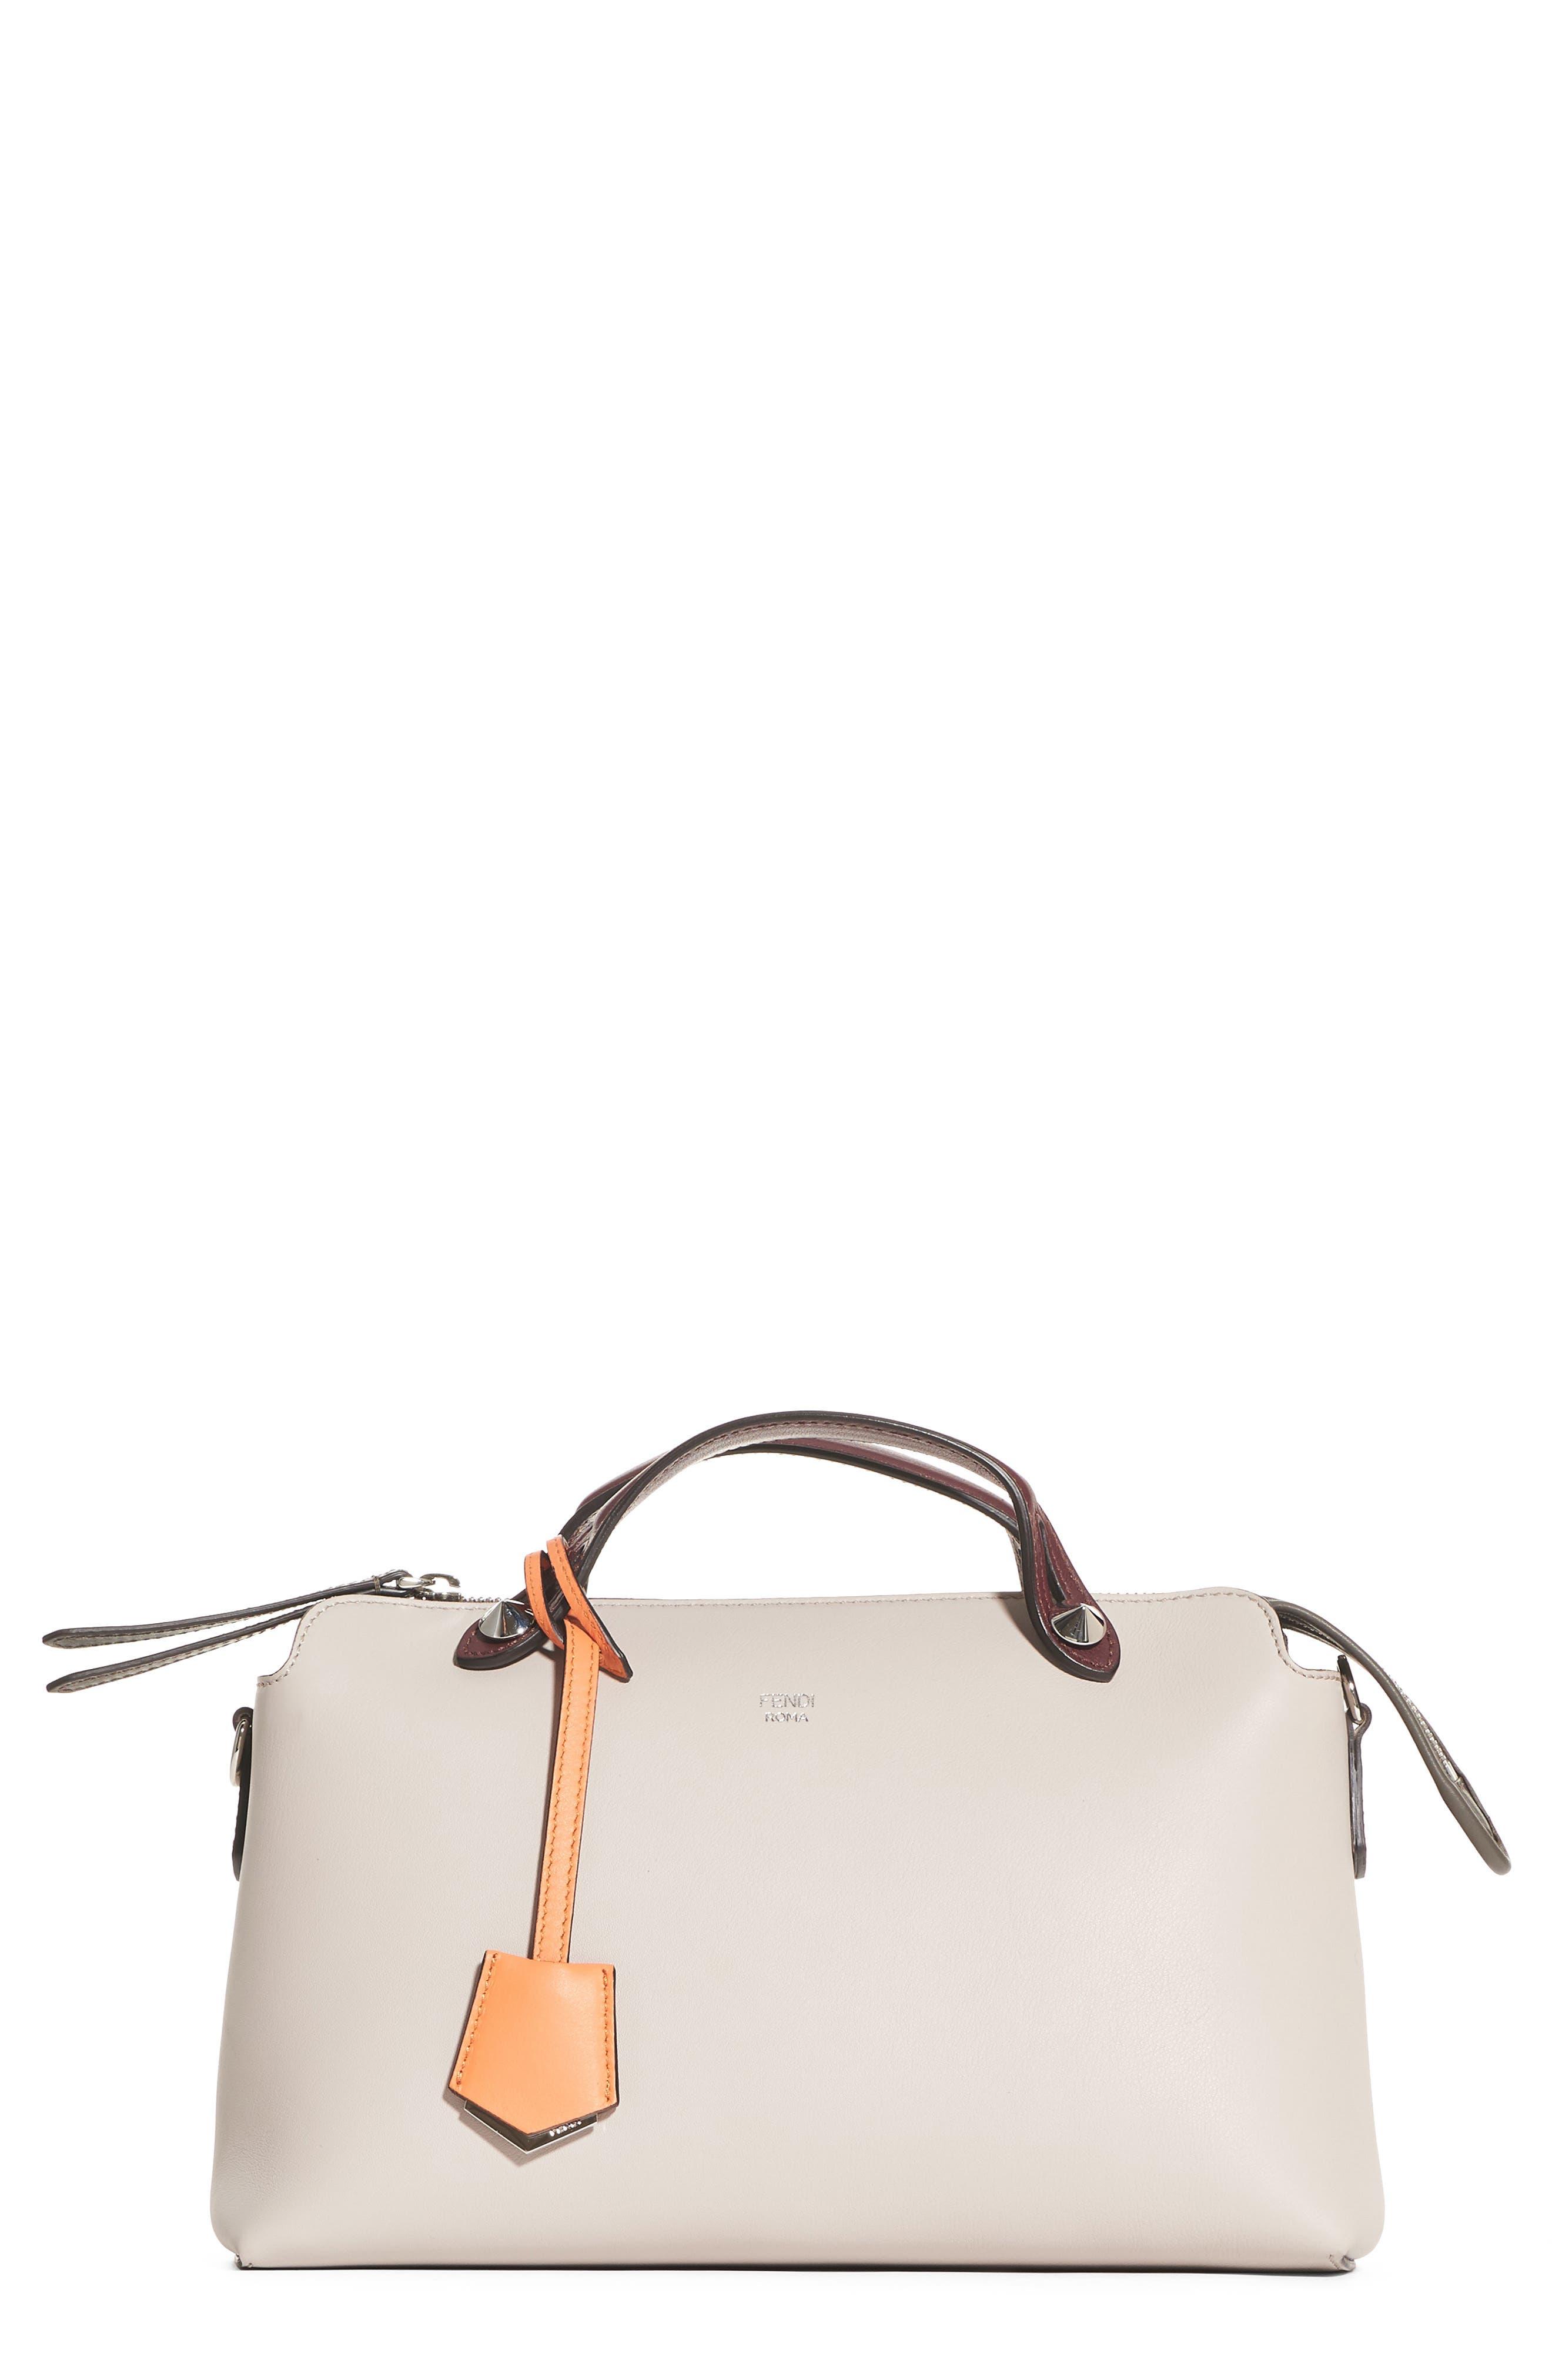 FENDI Medium By the Way Colorblock Leather Shoulder Bag